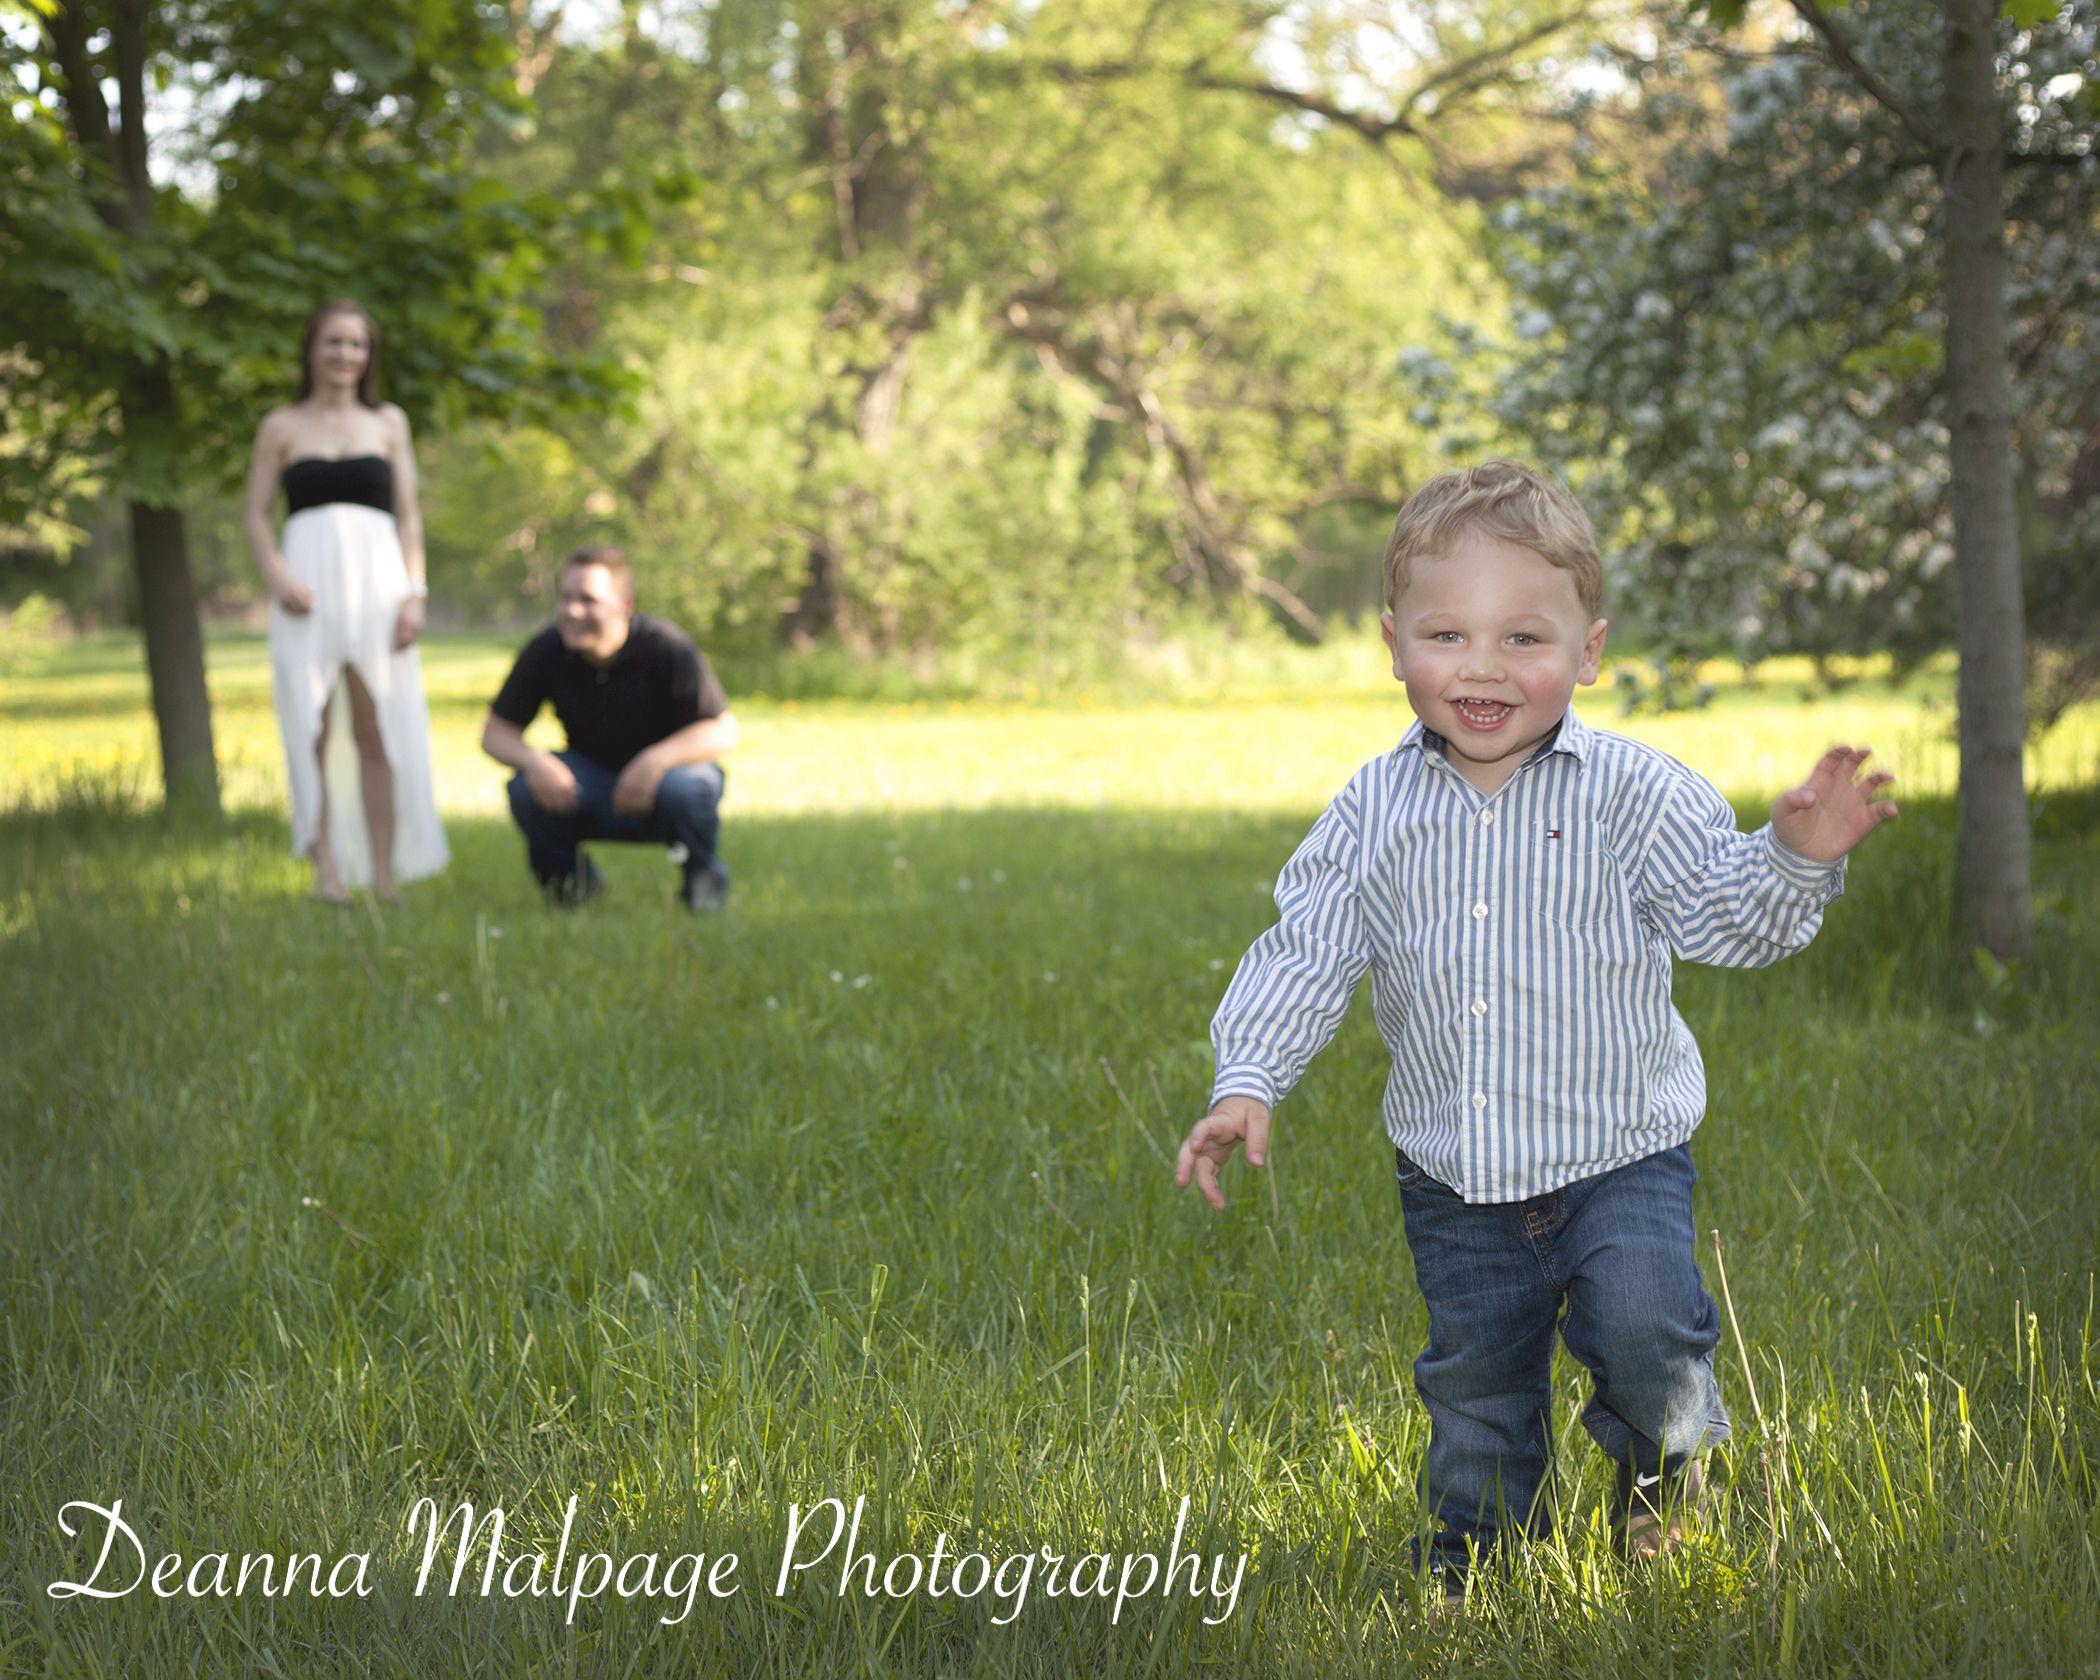 Family | Deanna Malpage Photography | Family | Pinterest | Photography